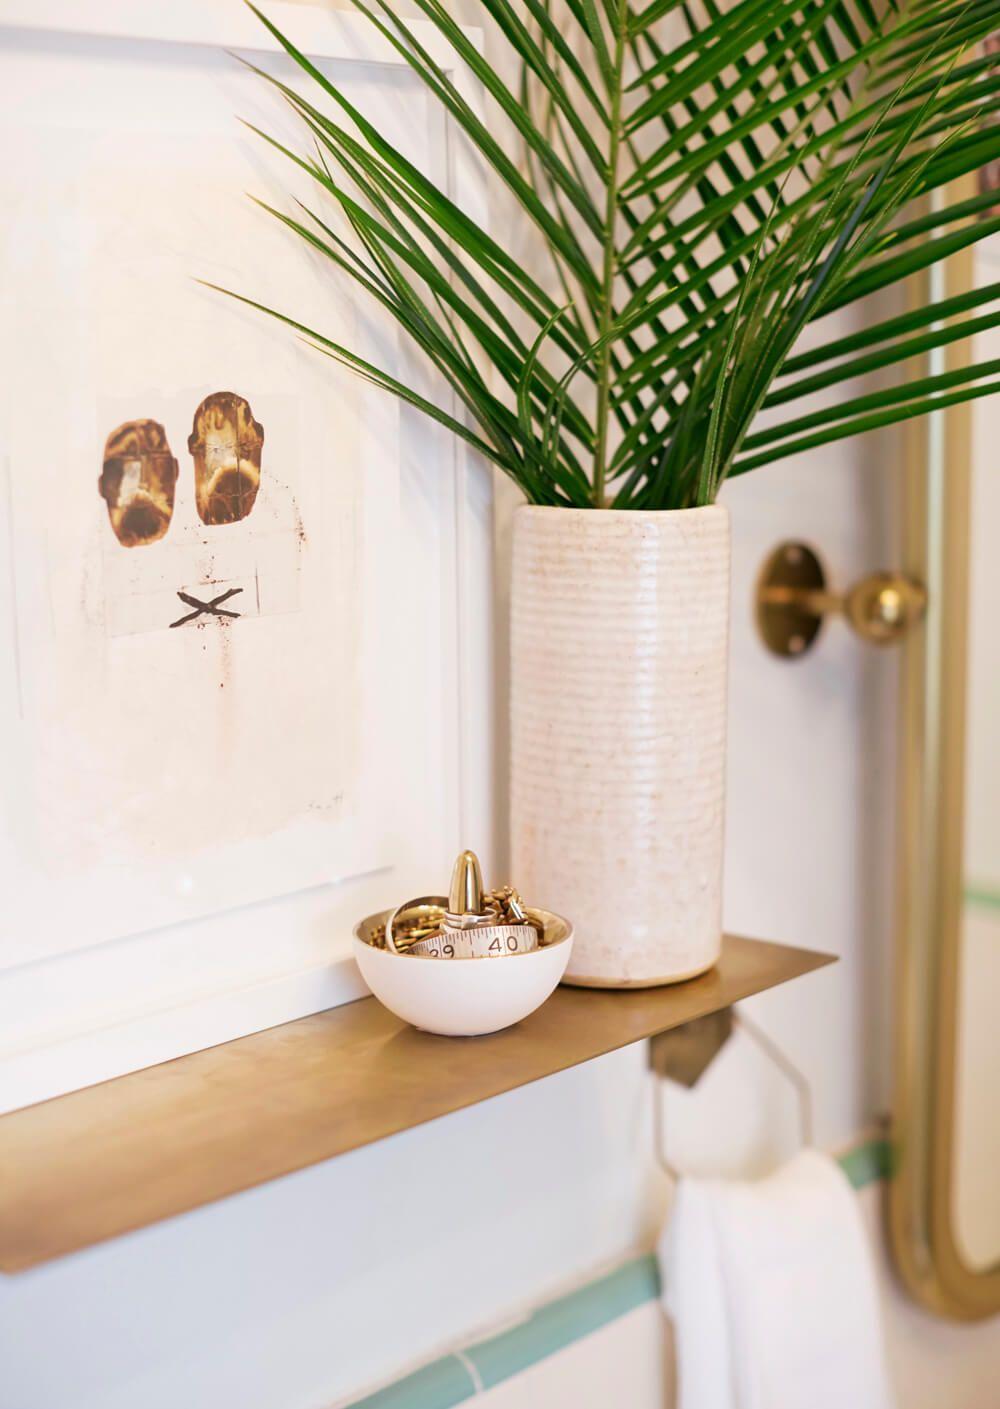 Bathroom Decorating Ideas Rental apartment rental bathroom makeover takeover redesign brady tolbert